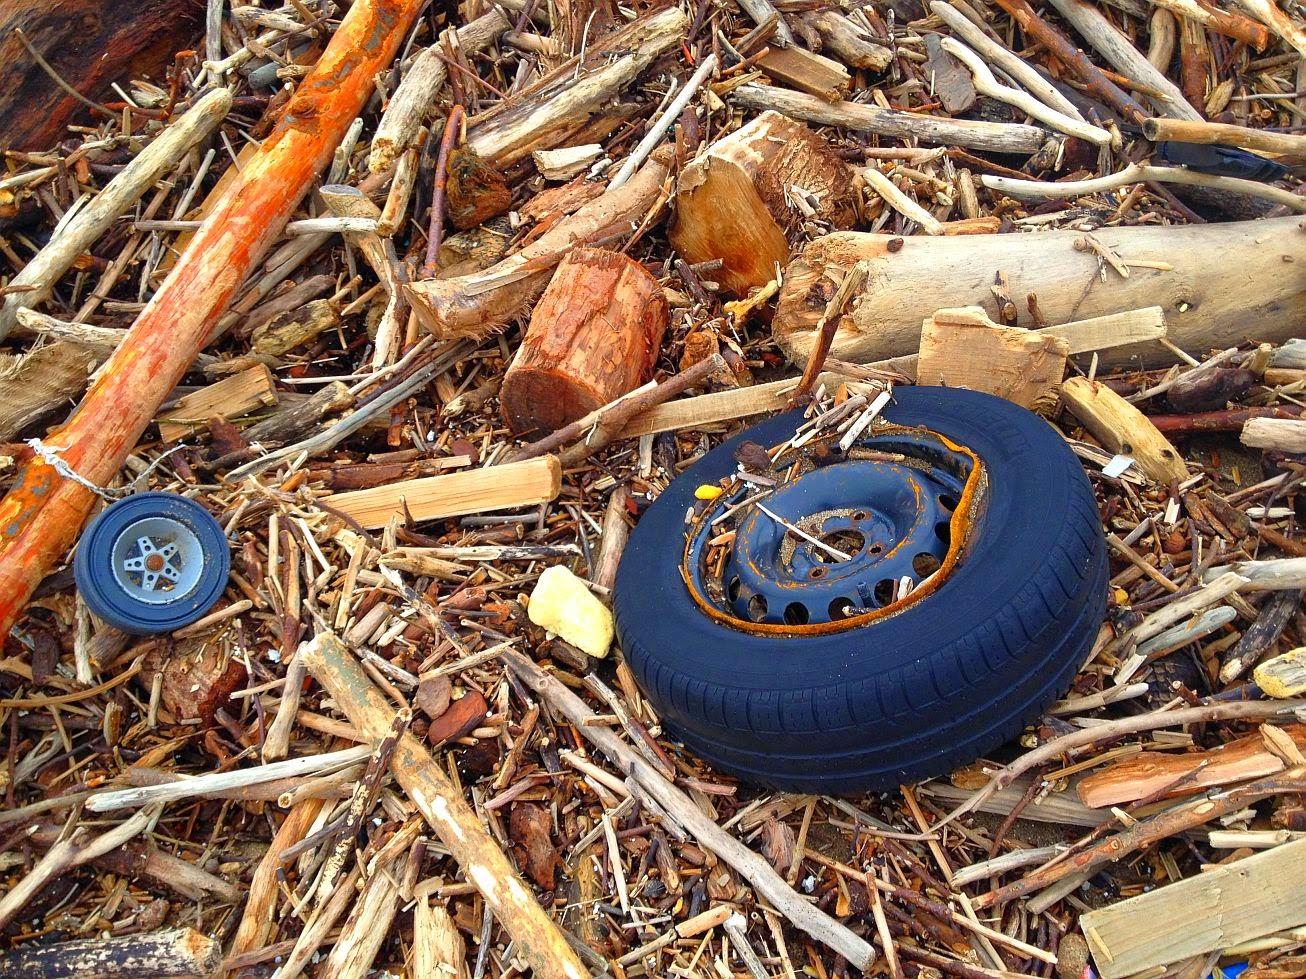 basura en la playa 01